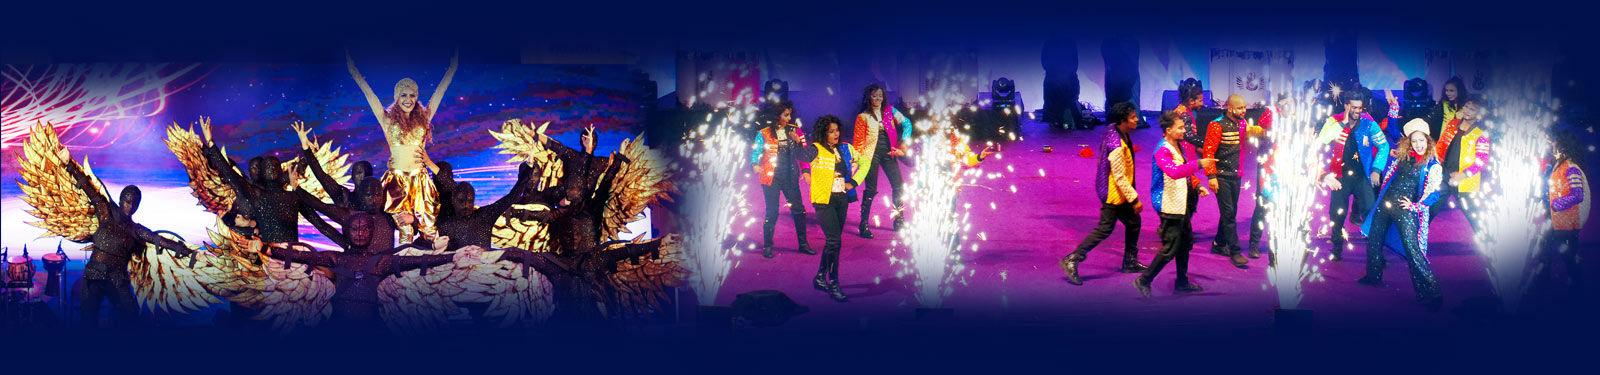 Best Corporate Dance Event Entertainment Shows in Delhi India